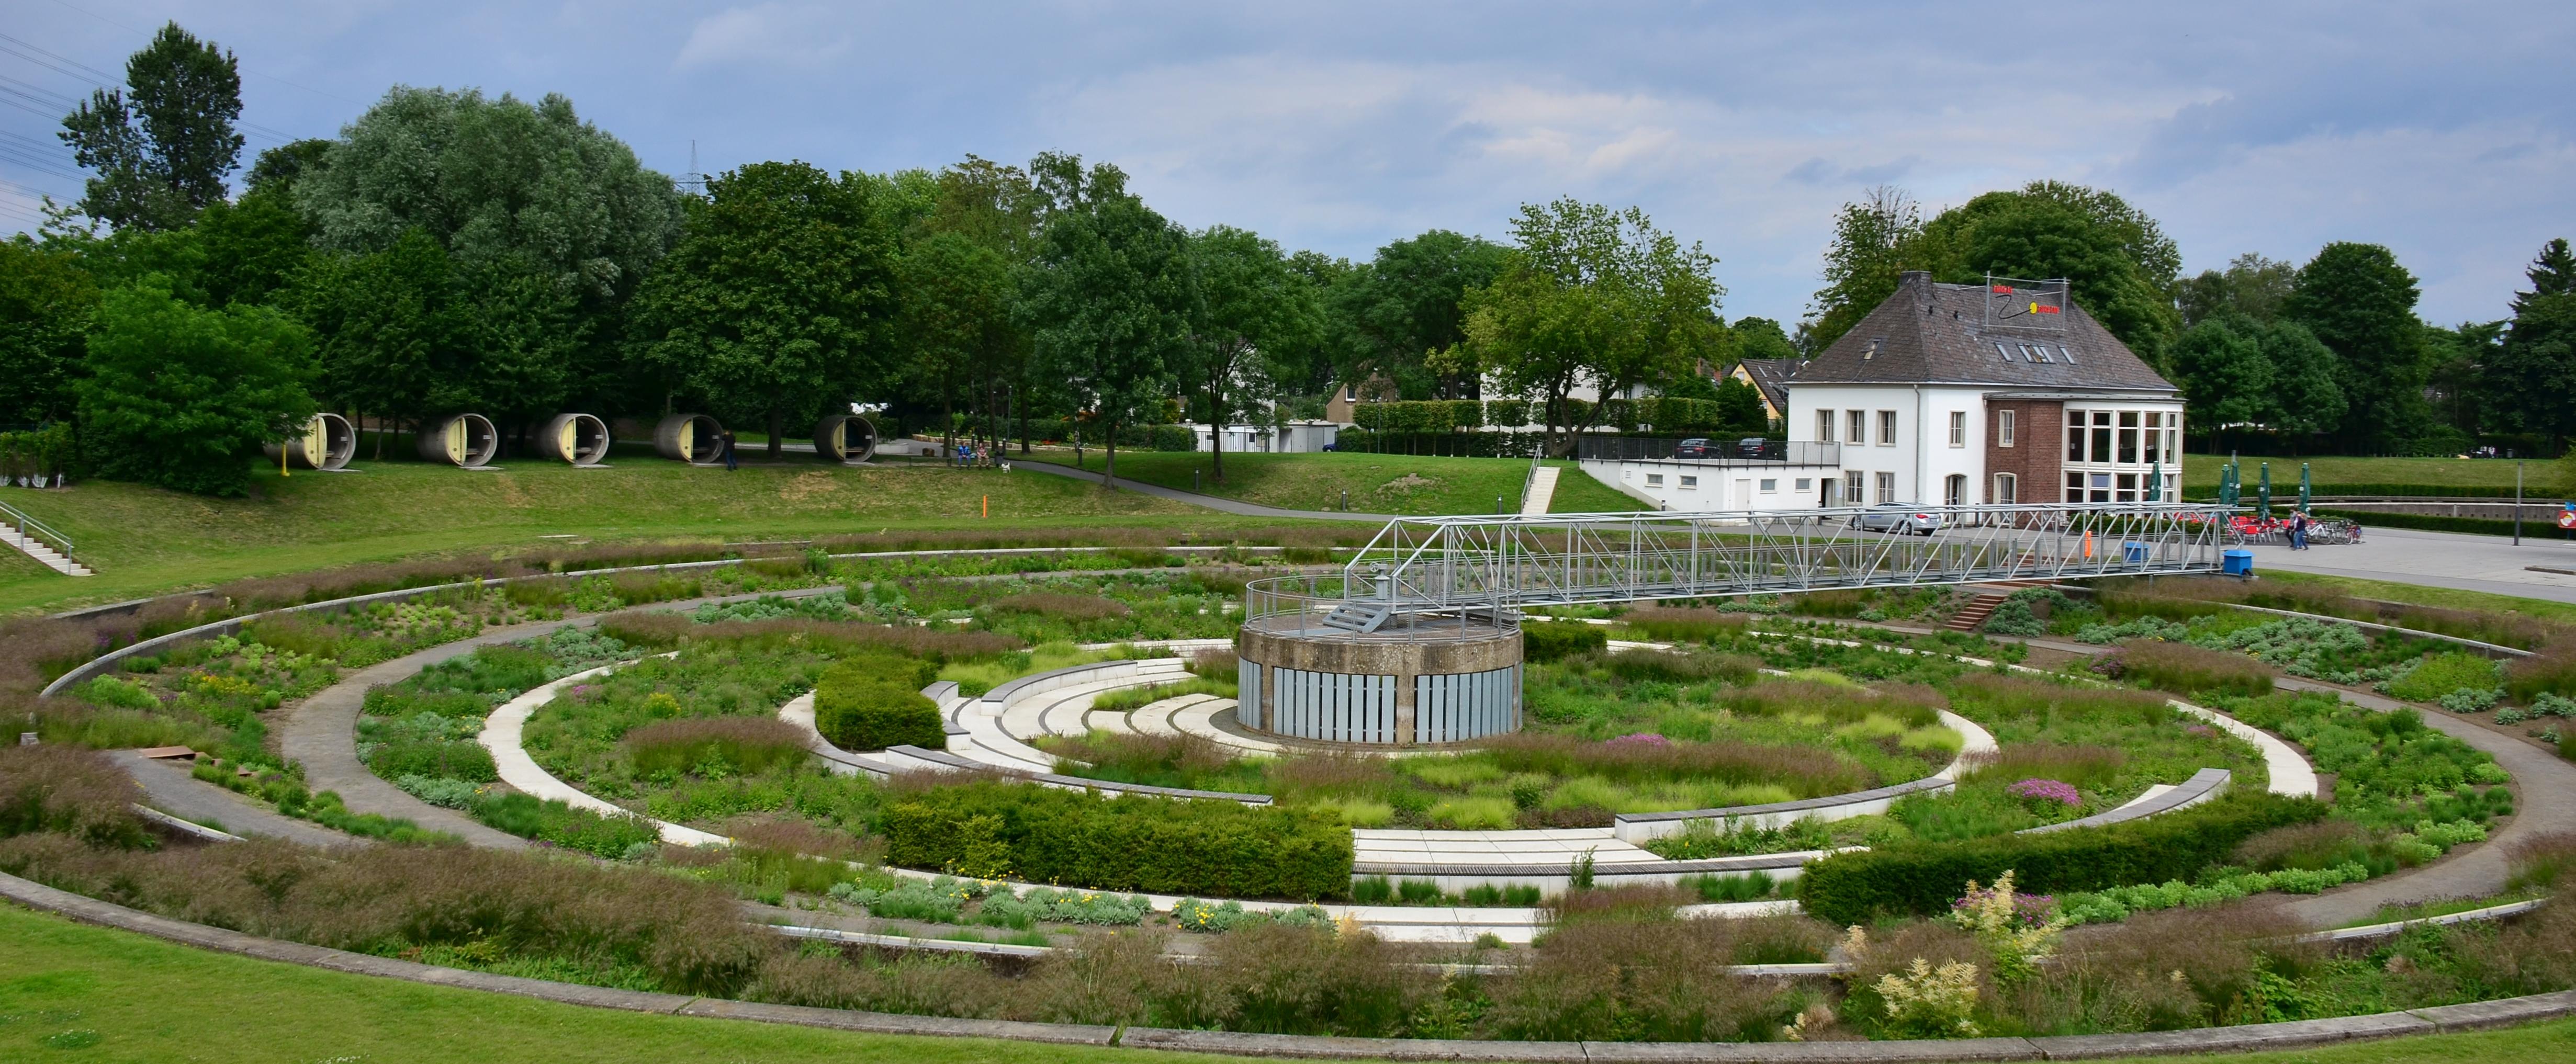 Berne Park